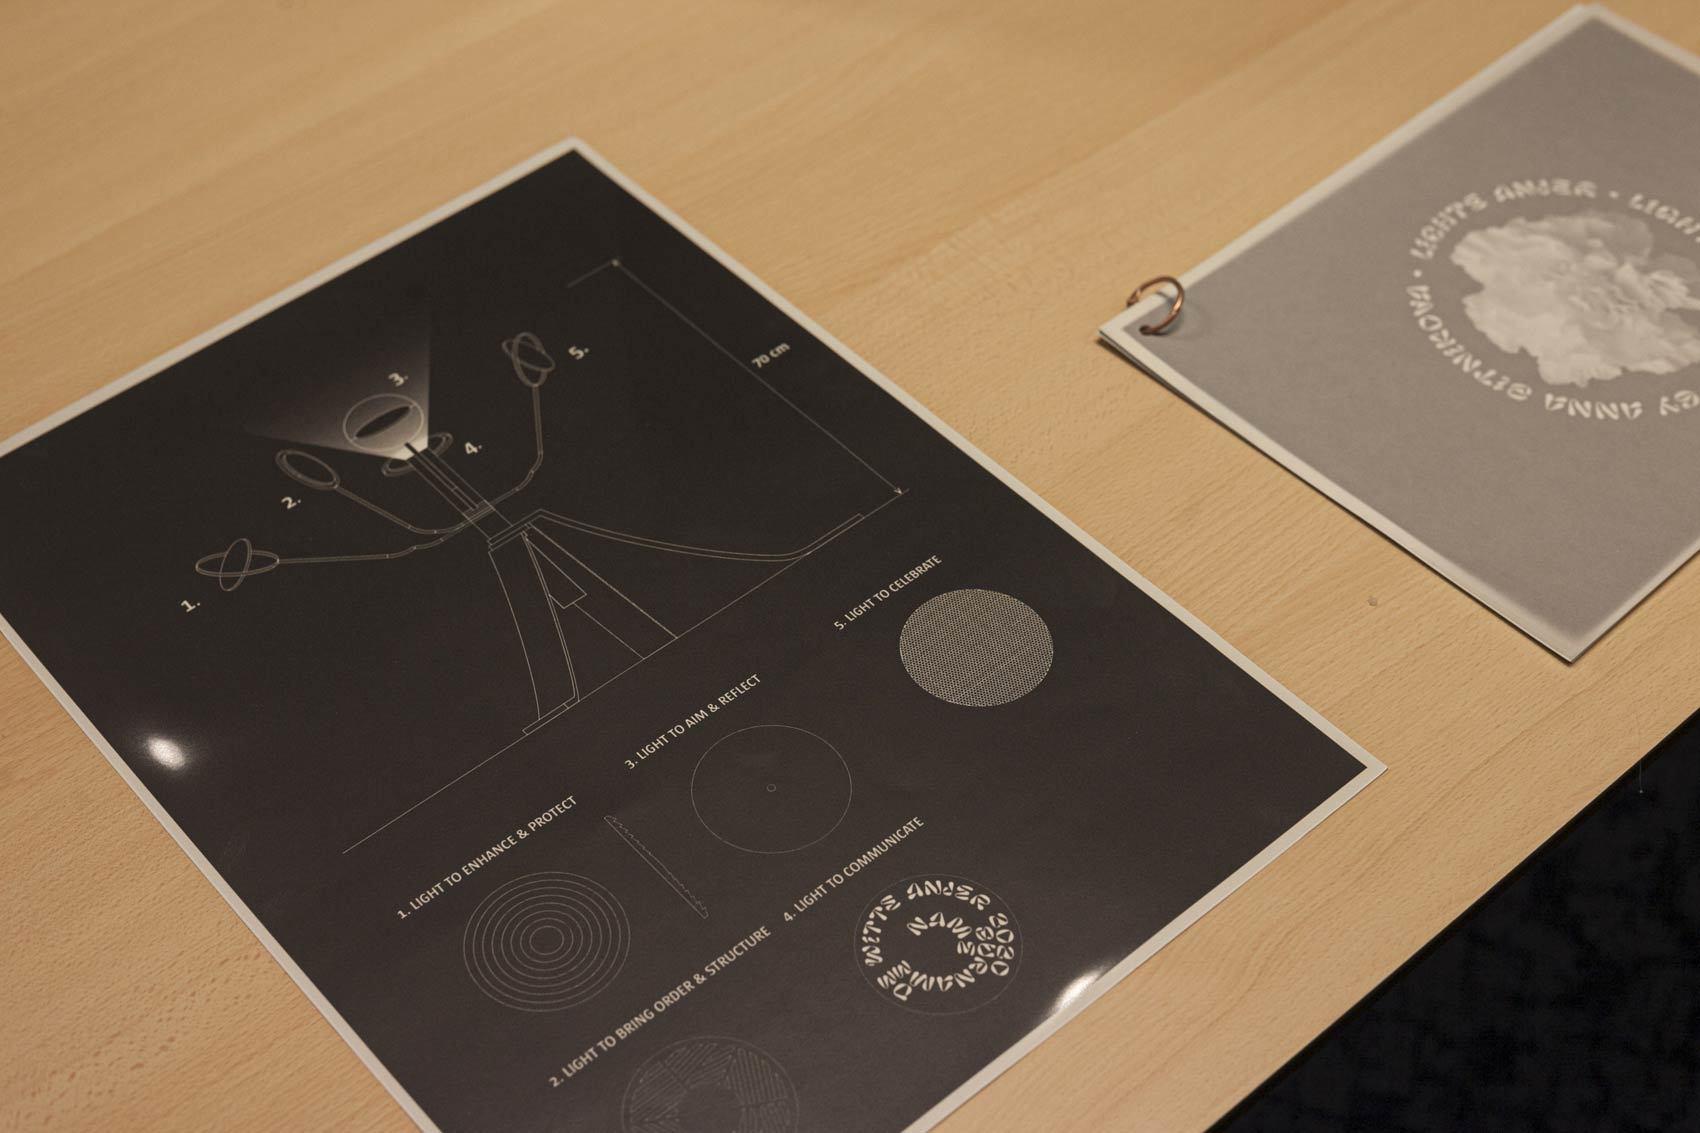 Anna Sitnikova - Witte Anjer Prijs ontwerpconcept 2020